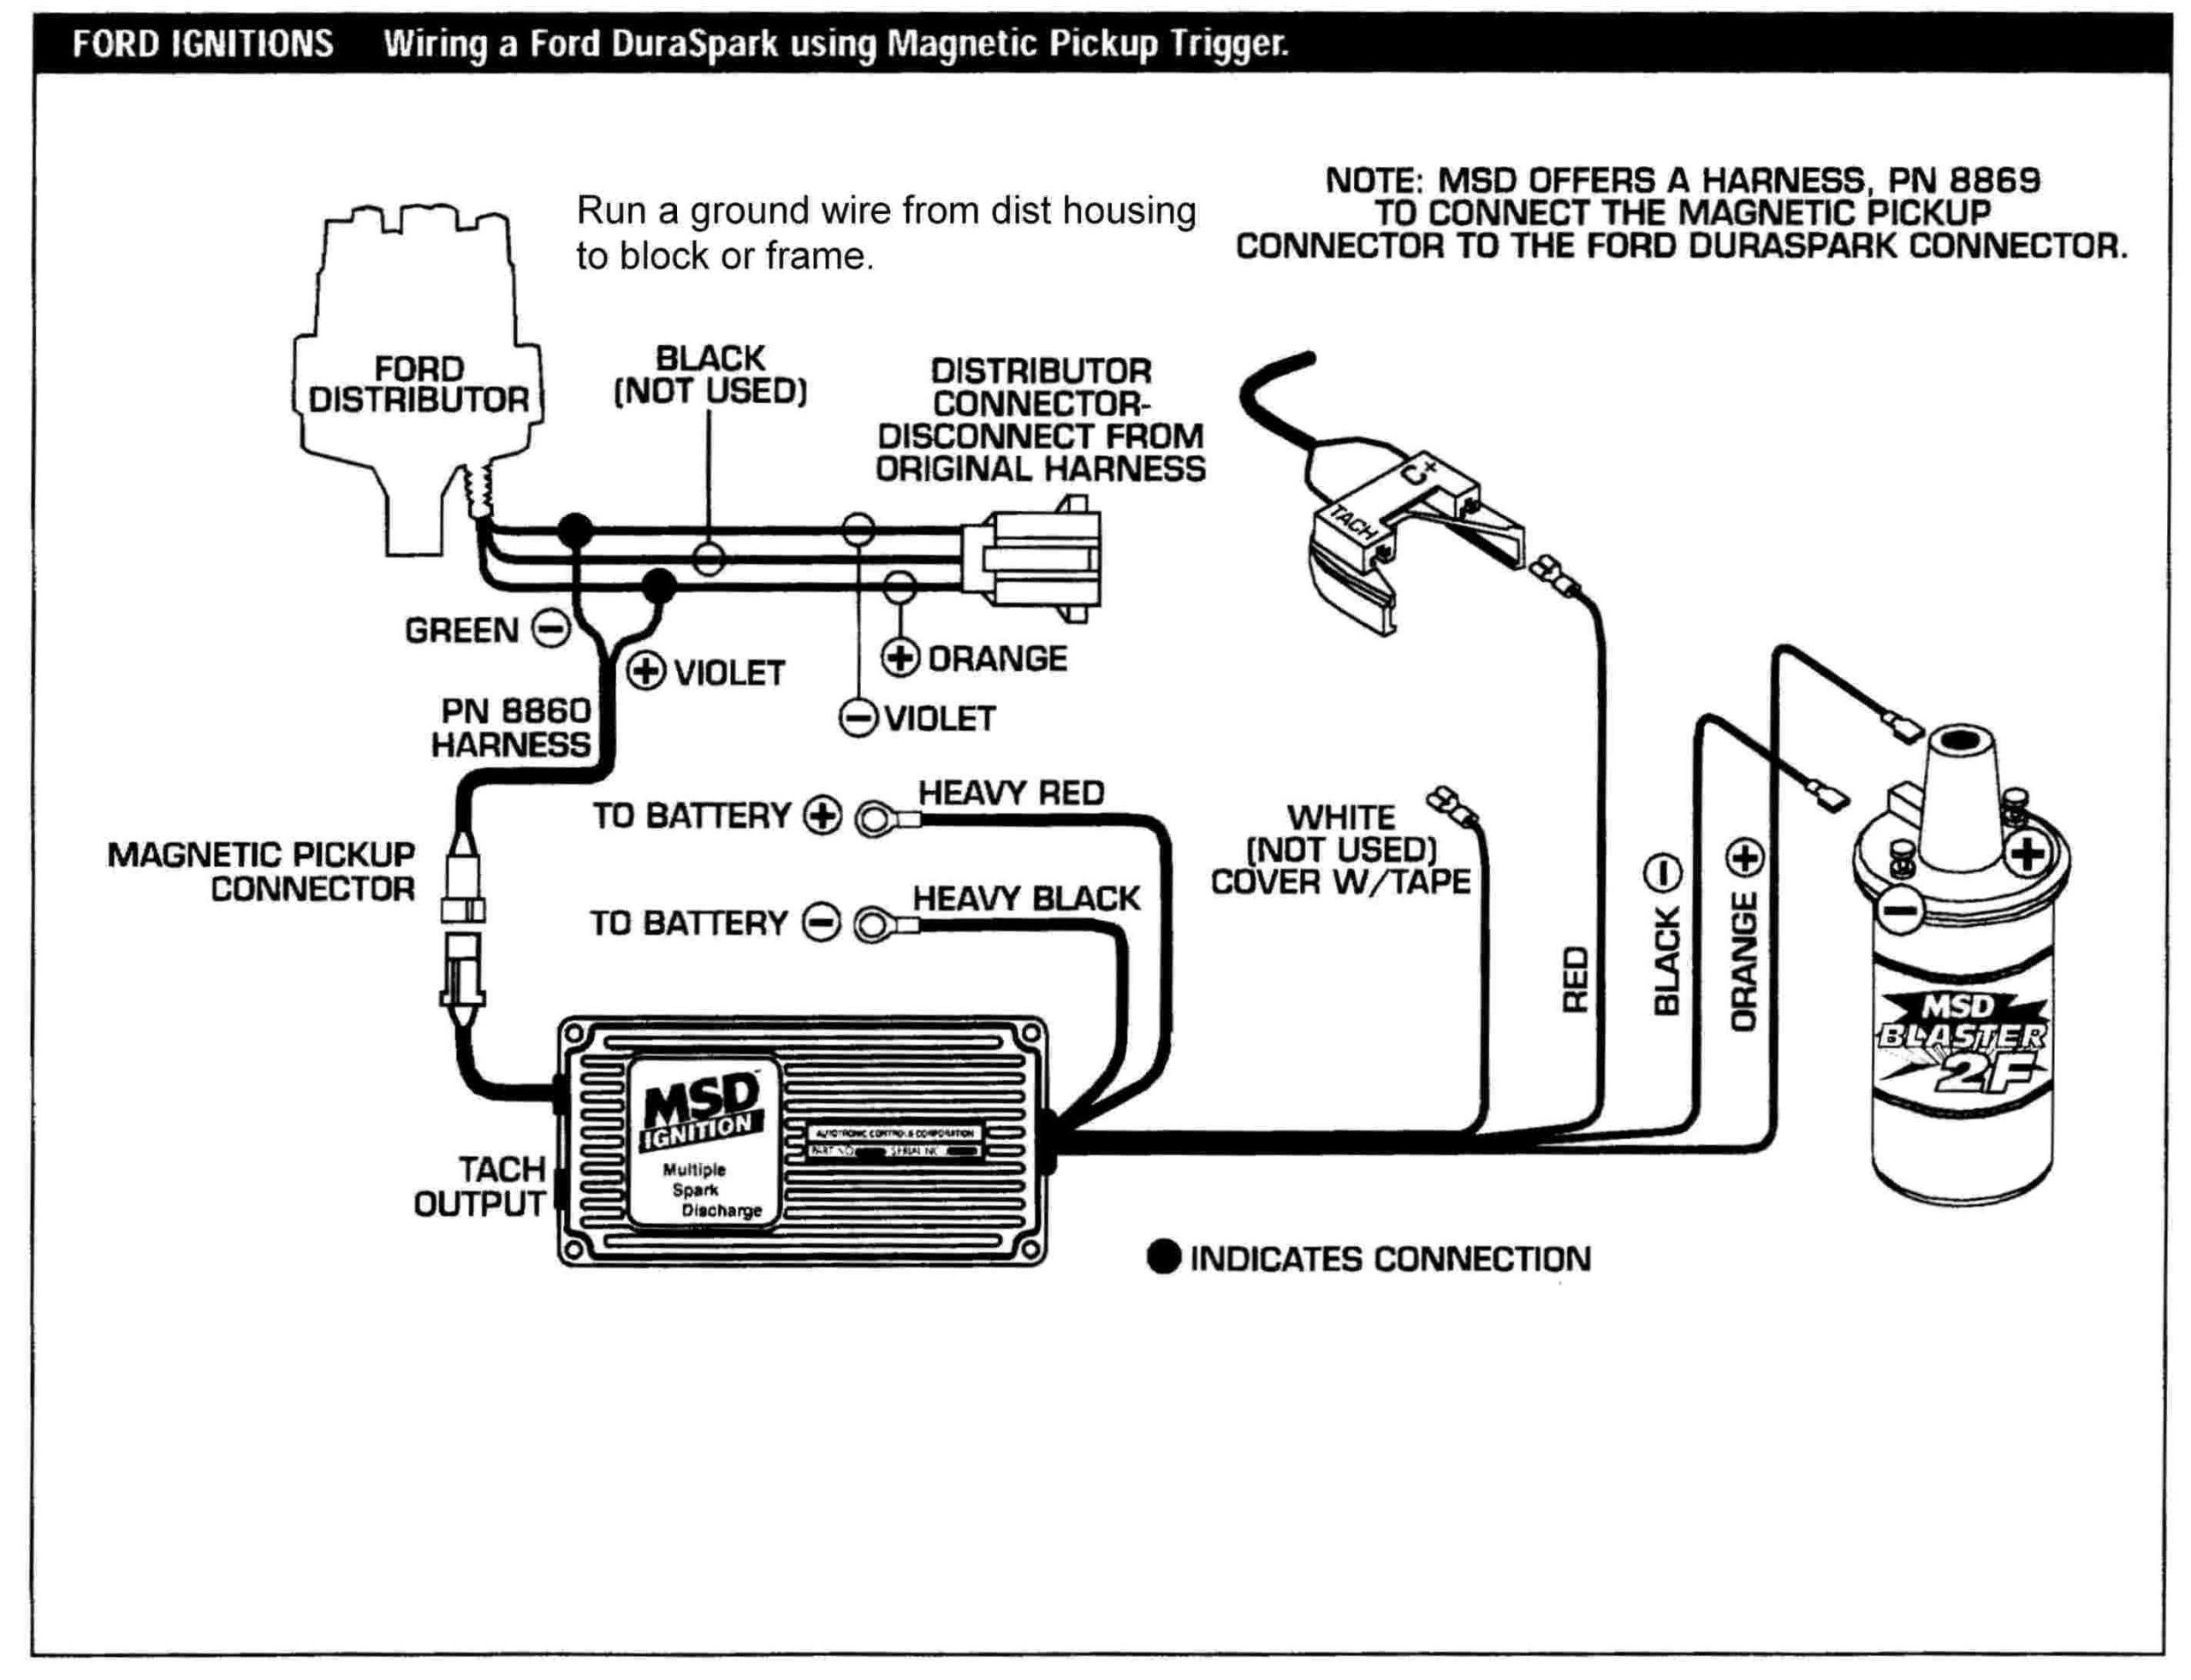 57C262 Ford 300 Inline 6 Wiring Diagram   Wiring Resources